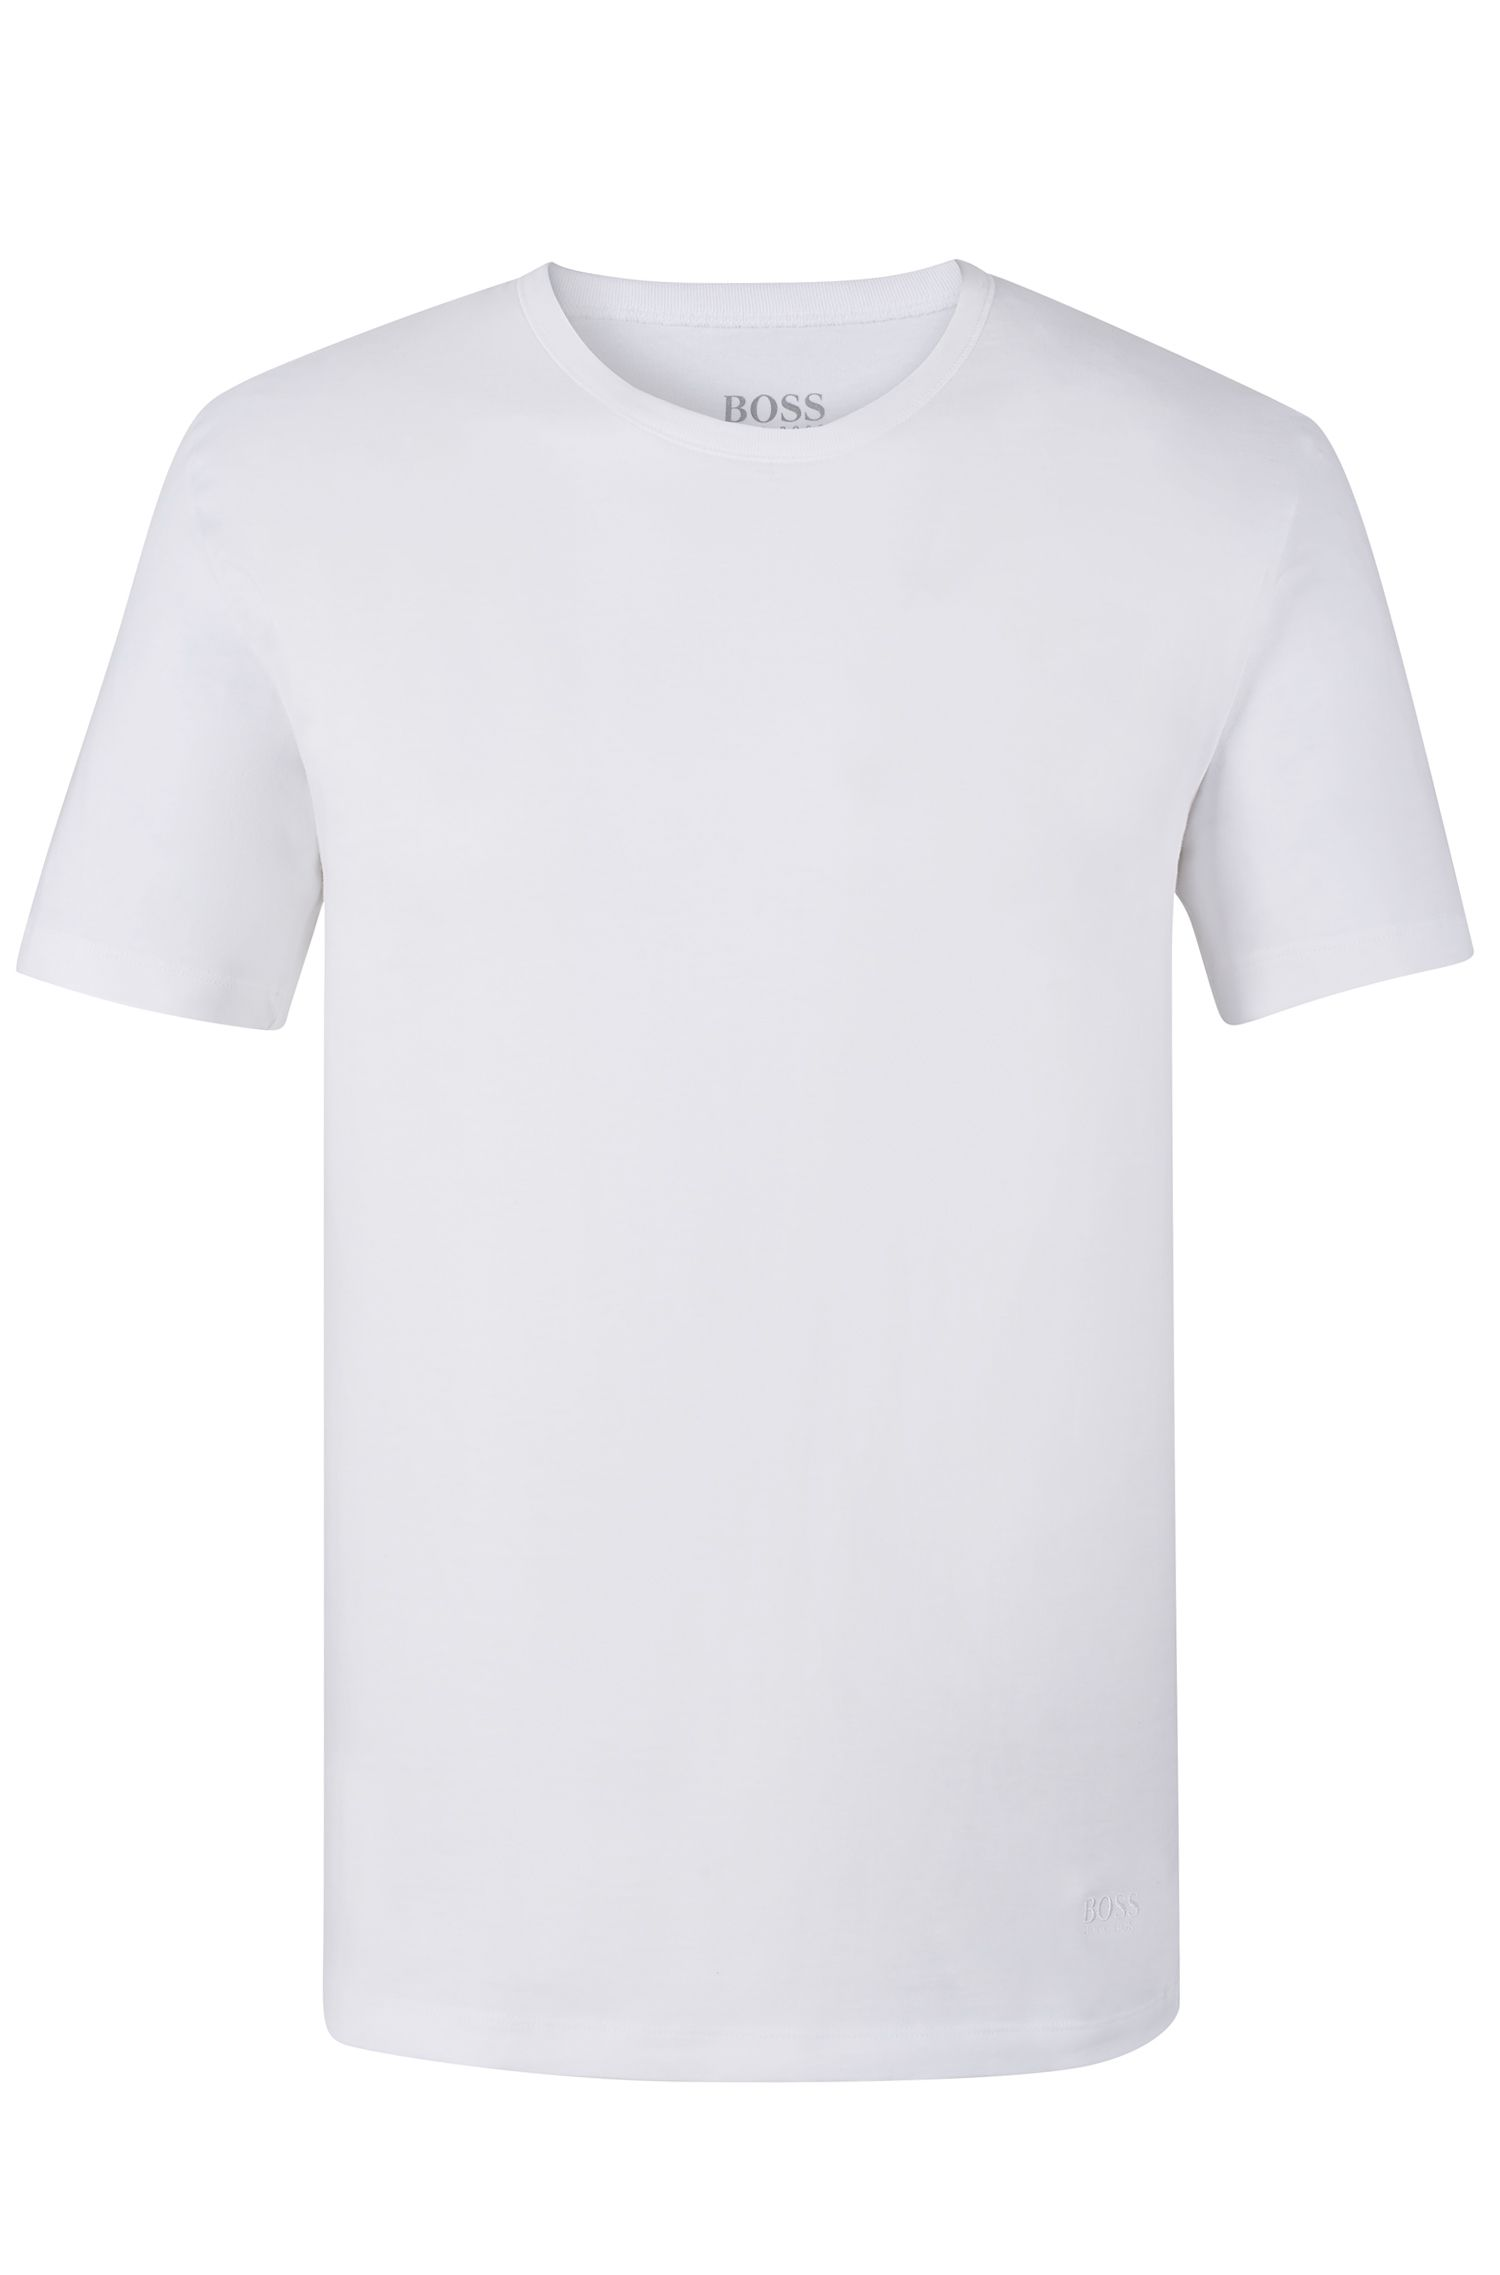 Cotton Jersey T-Shirt, 3-Pack | T-Shirt RN, White